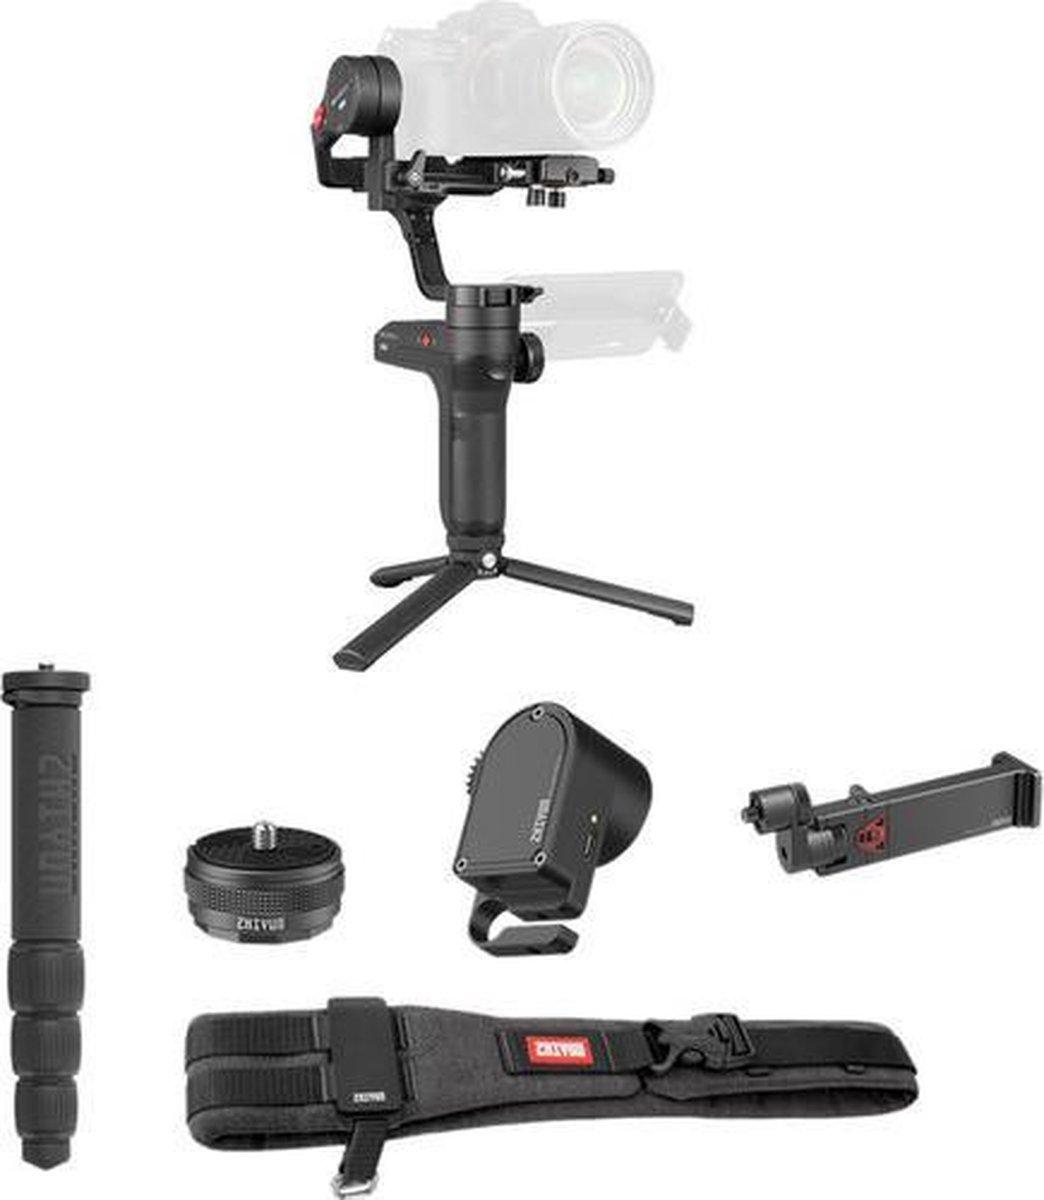 Zhiyun Weebill Lab + creator  5 accessory kit